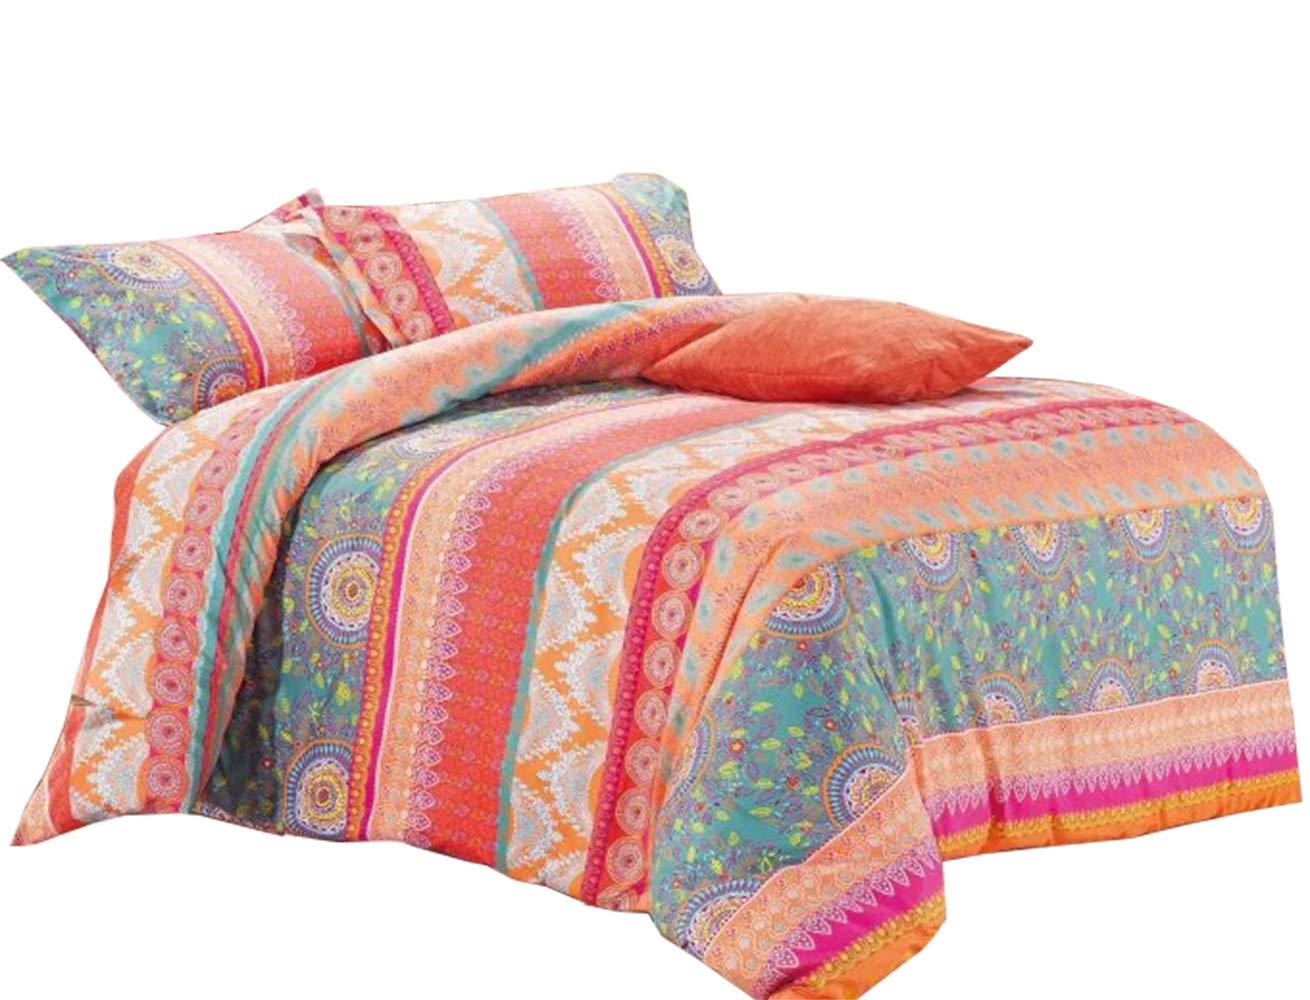 Wake In Cloud - Bohemian Comforter Set, Orange Coral Boho Chic Mandala Pattern Printed, Soft Microfiber Bedding (3pcs, Twin Size)